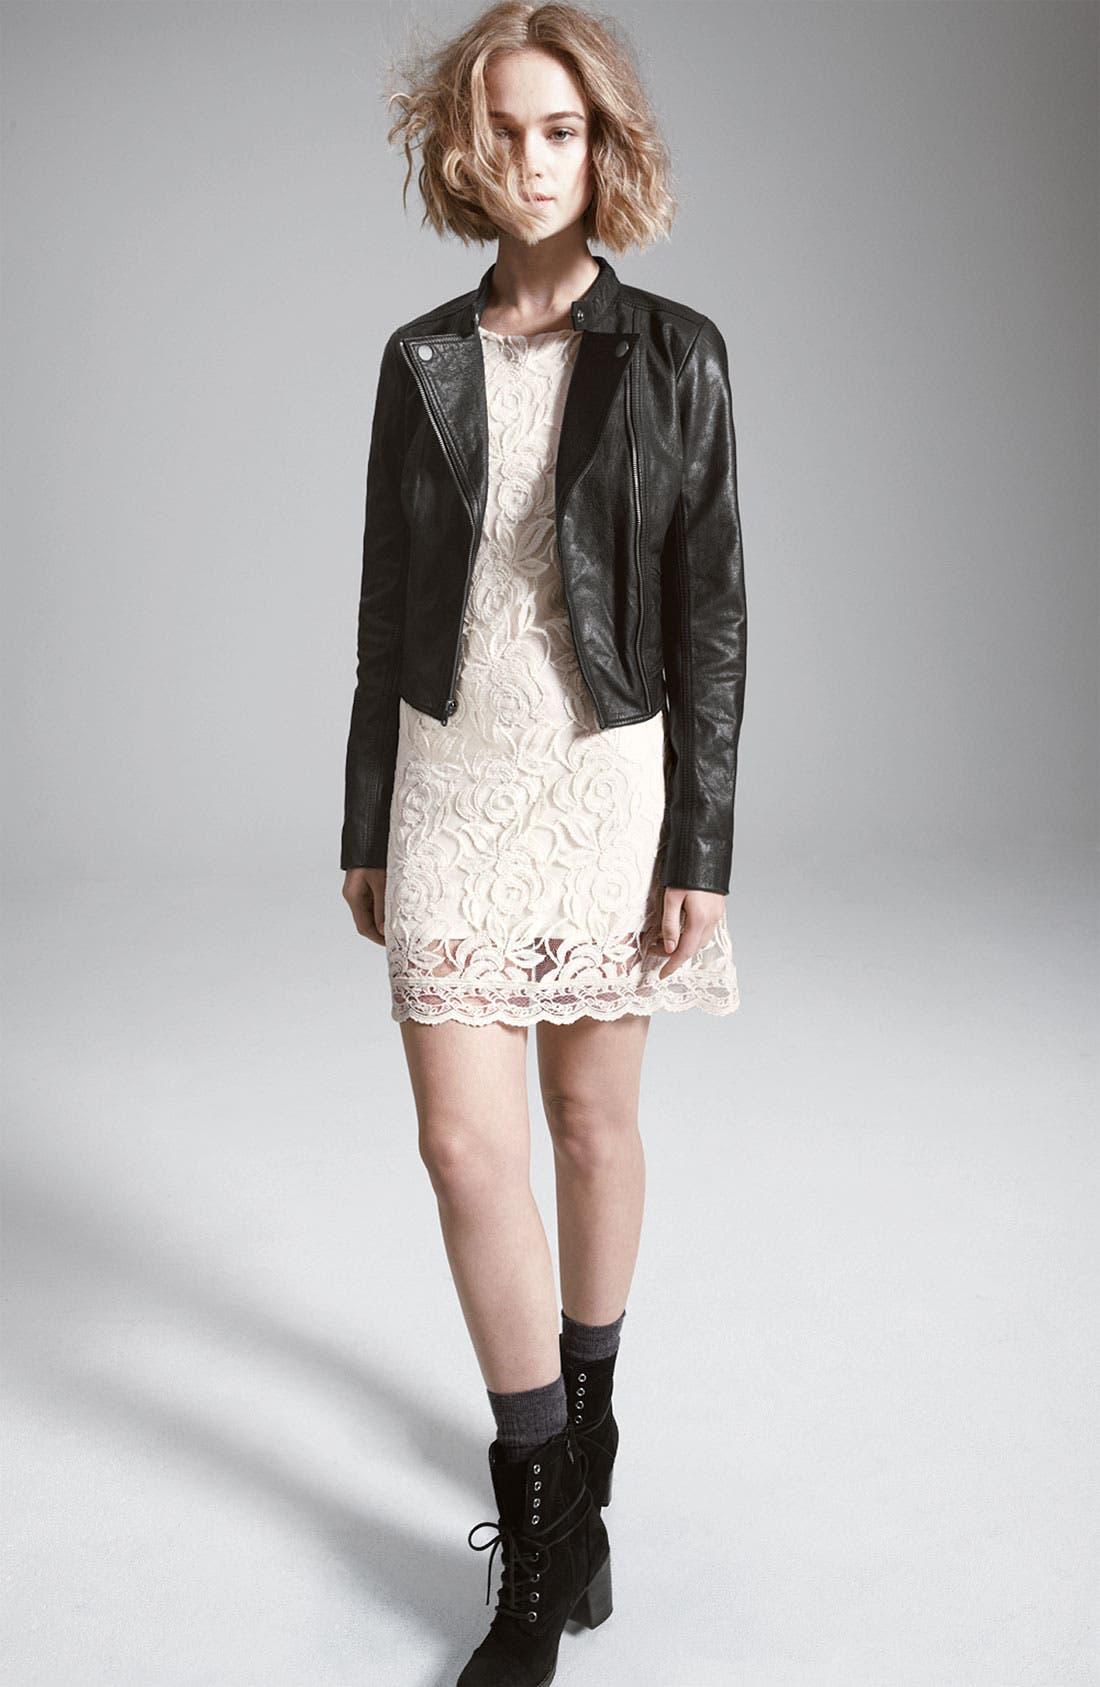 Main Image - Rubbish® Leather Jacket & Fire Dress